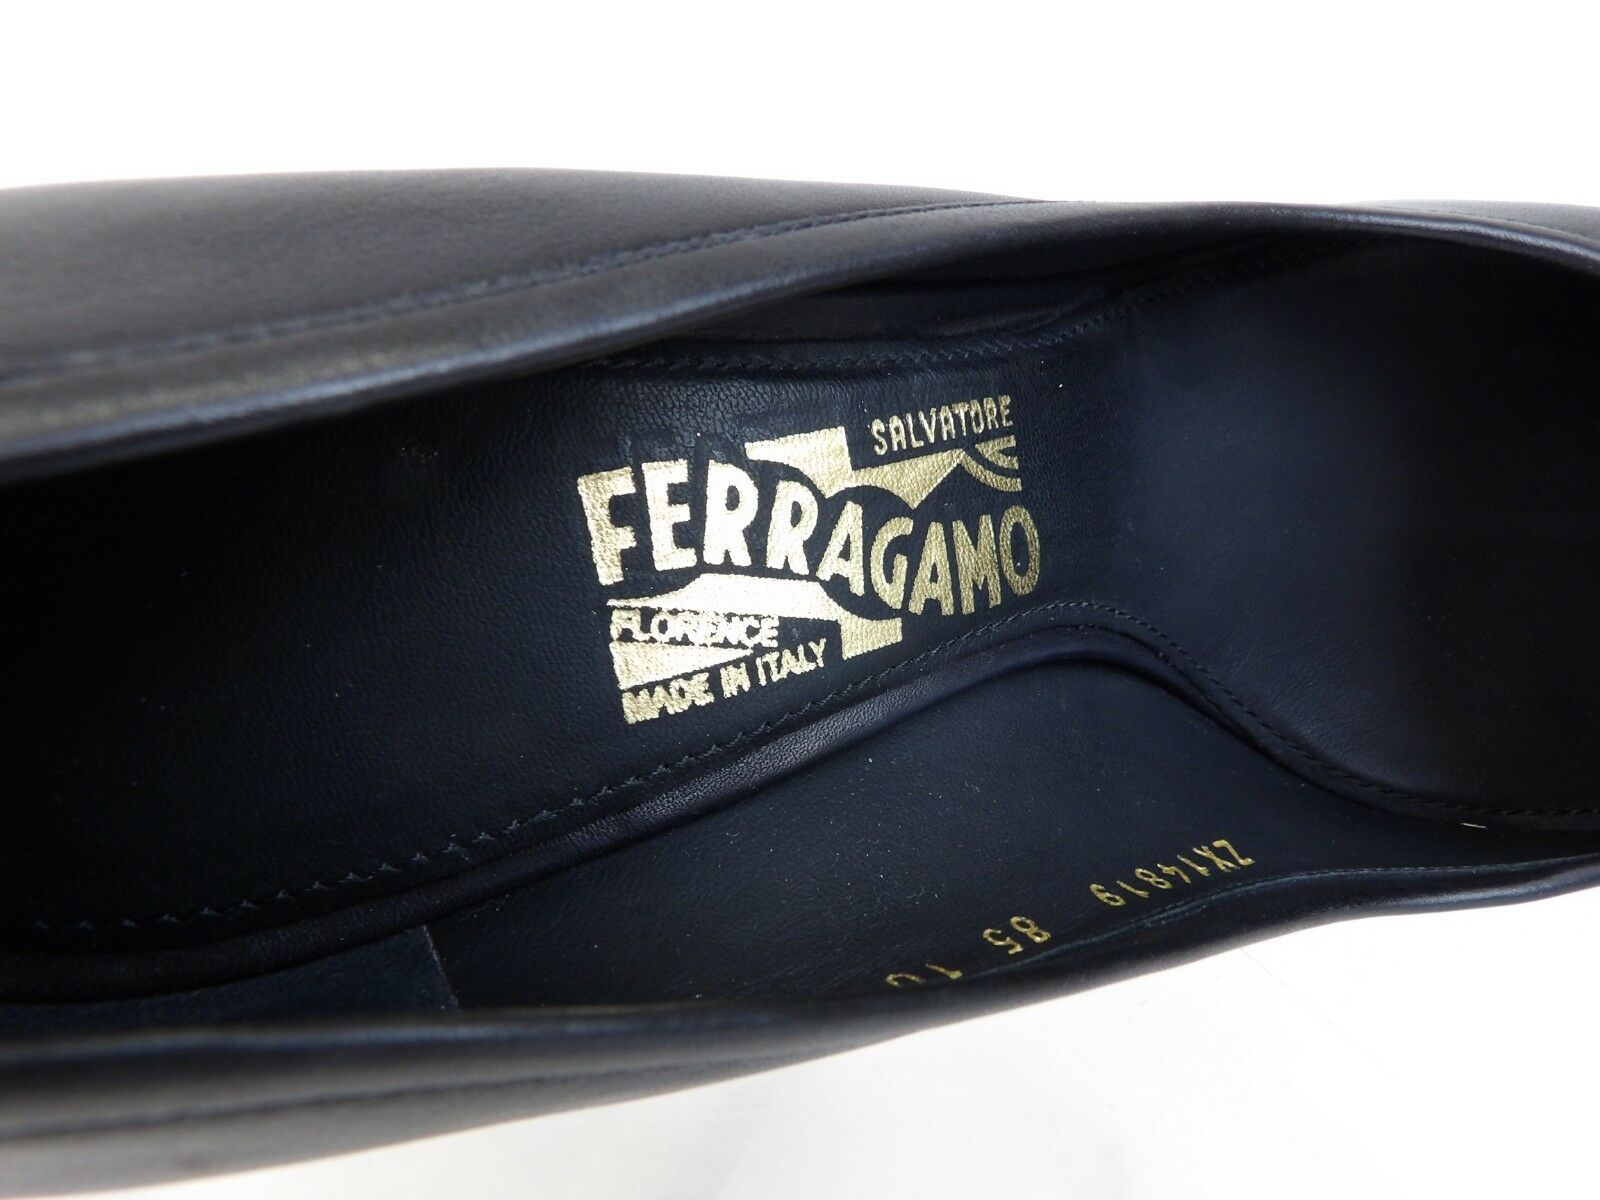 SALVATORE FERRAGAMO FERRAGAMO FERRAGAMO ELGA BLACK LEATHER gold TONE GANCINI FRINGE BIT PUMPS 10 B 0b16dc